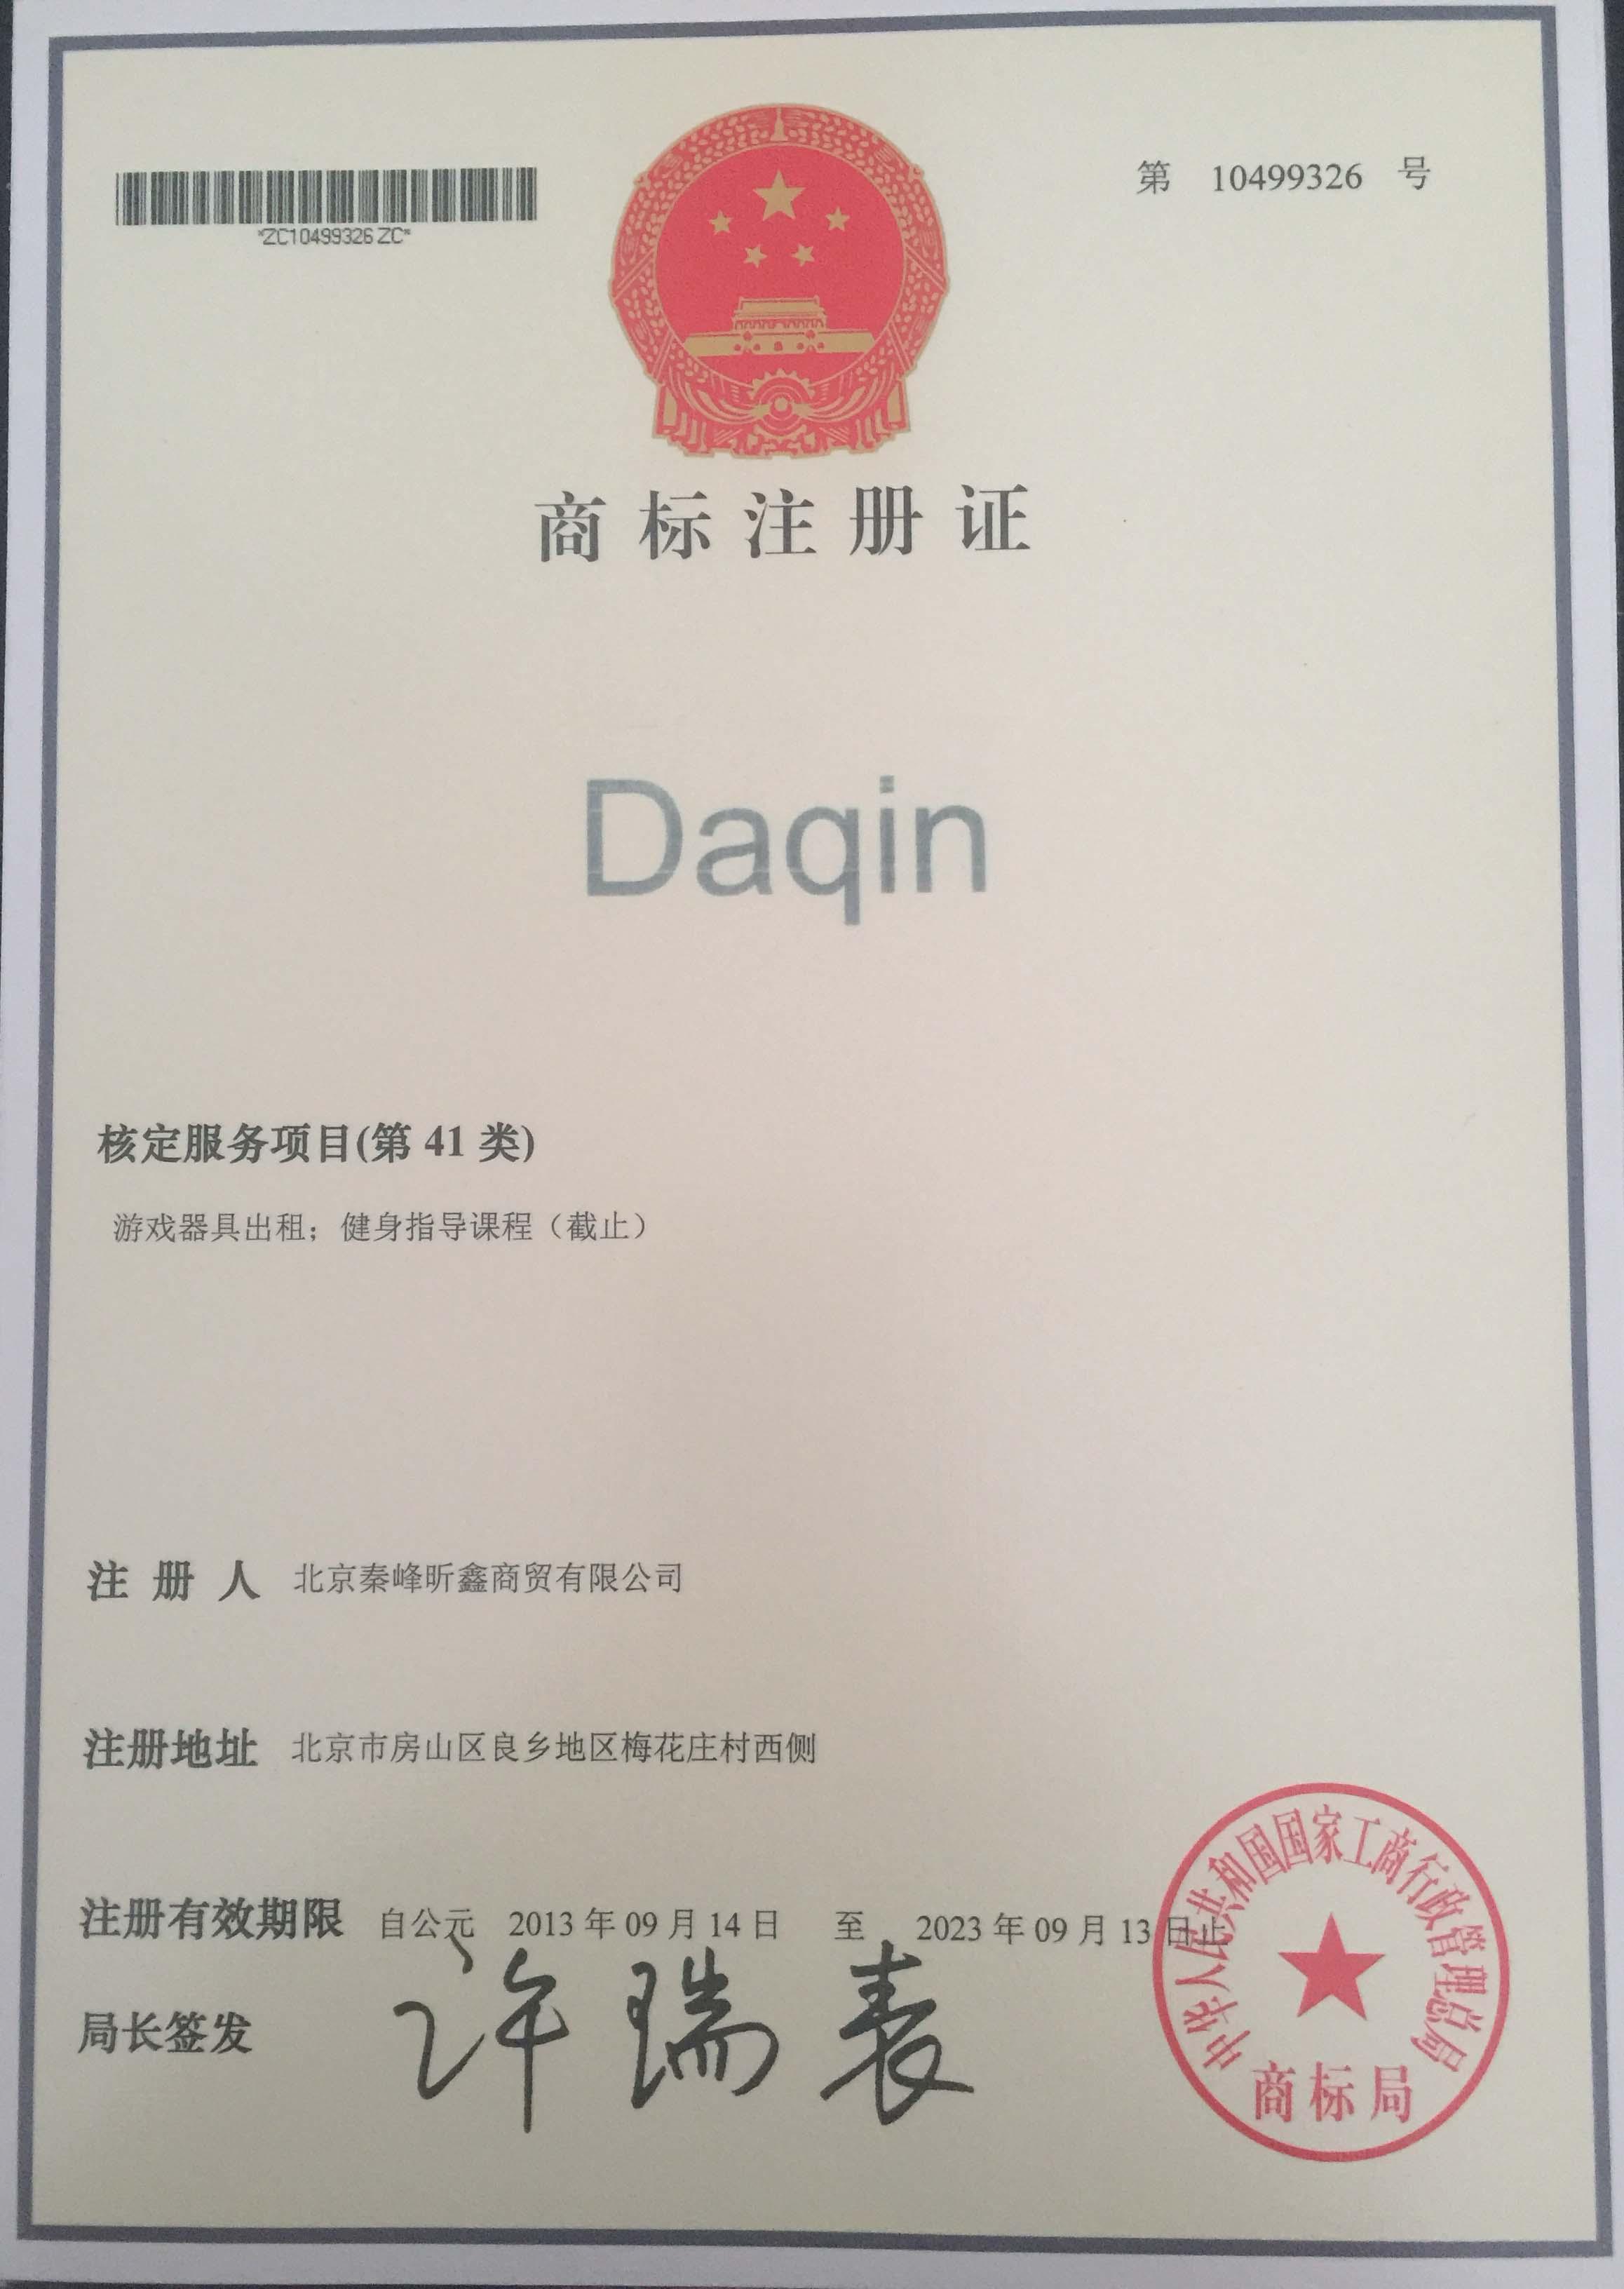 Daqin 41类商标注册证